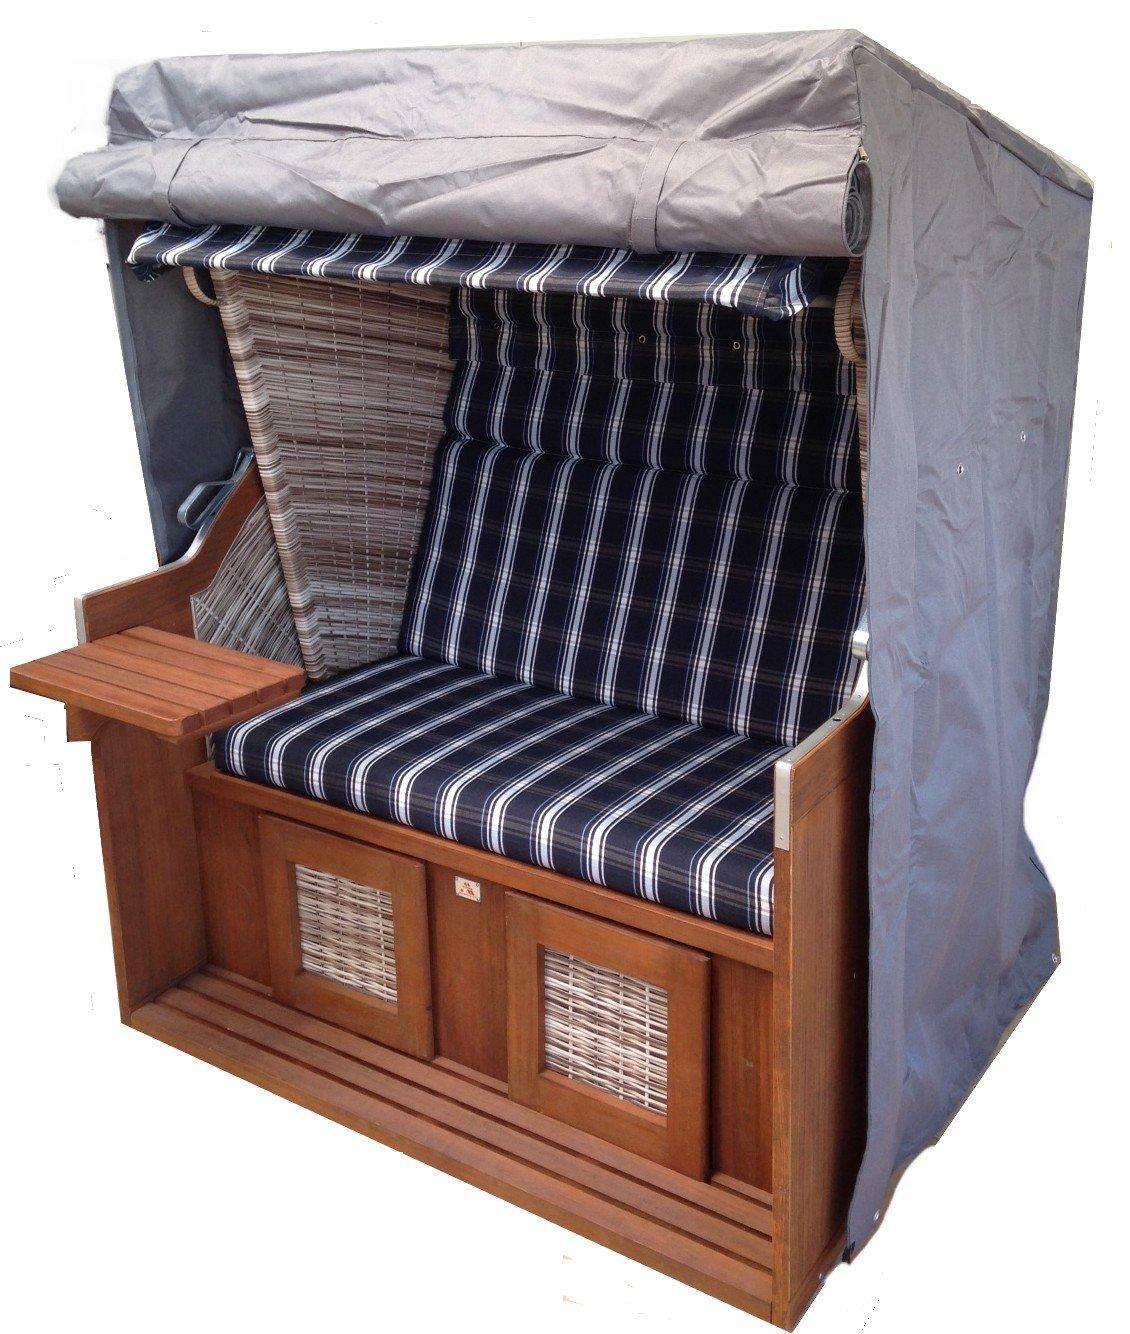 Strandkorbhülle Strandkorbhaube Comfort Premium 130cm x 100cm grau osoltus